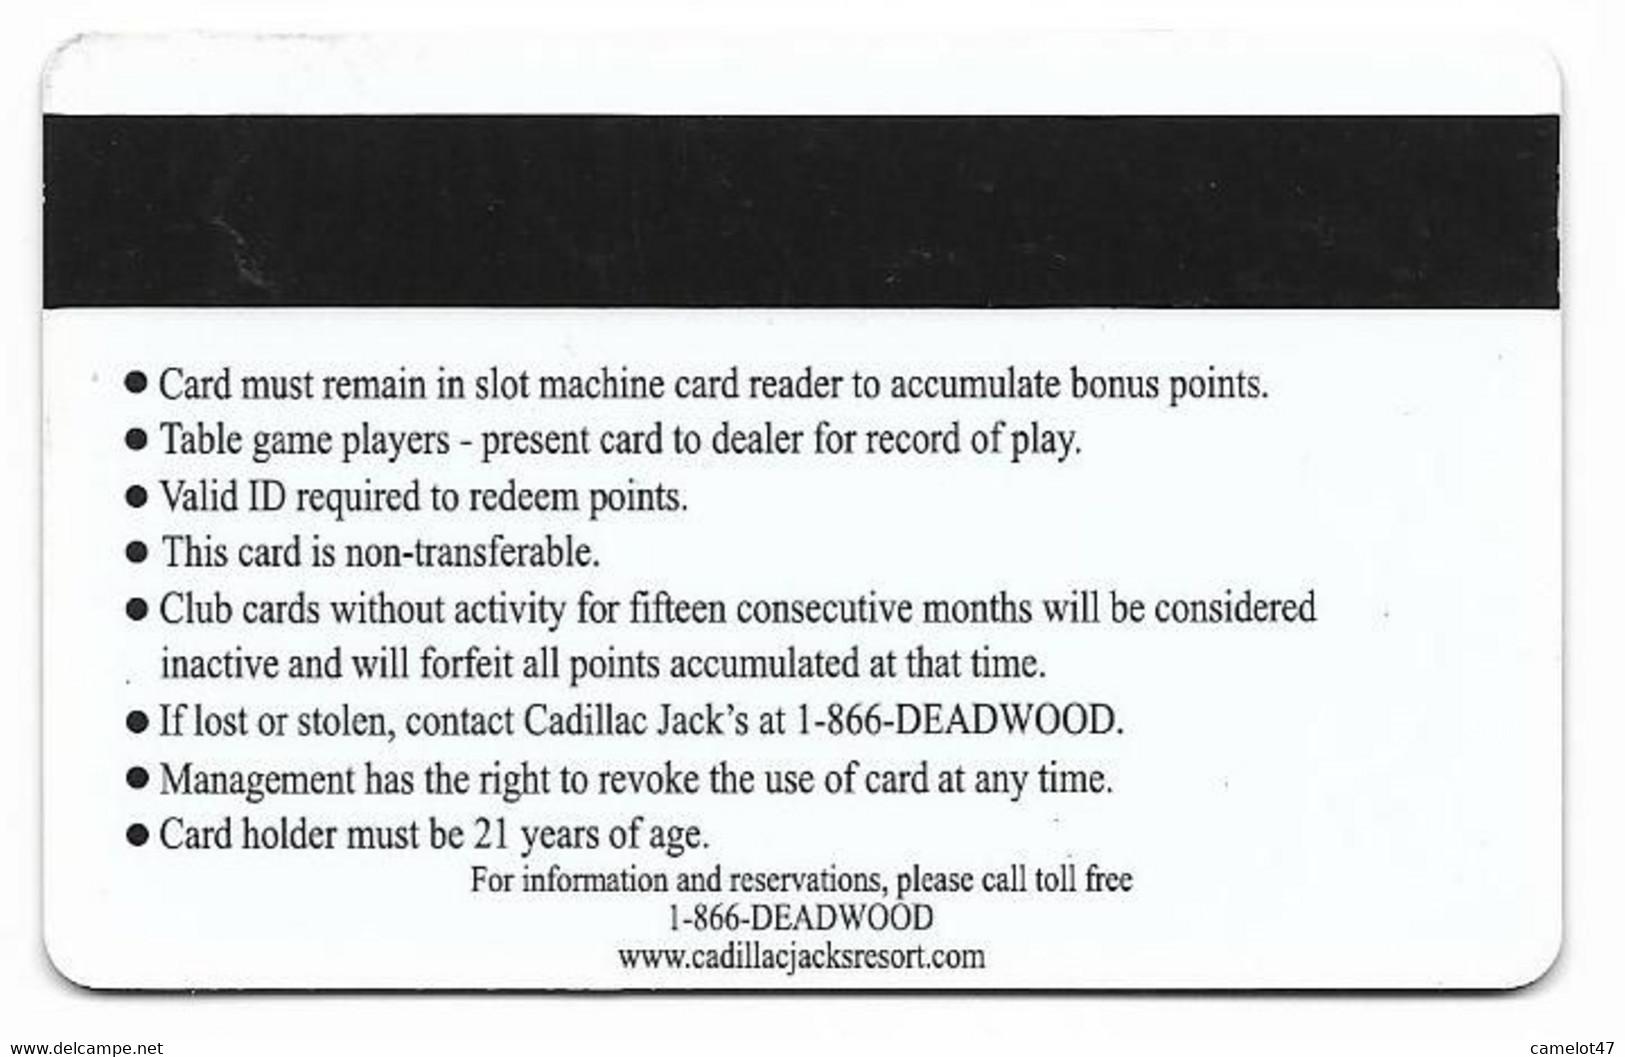 Cadillac Jack's Casino, Deadwood, SD, U.S.A. Older Used  BLANK Slot Or Player's Card, # Cadillacjacks-6blank - Casino Cards